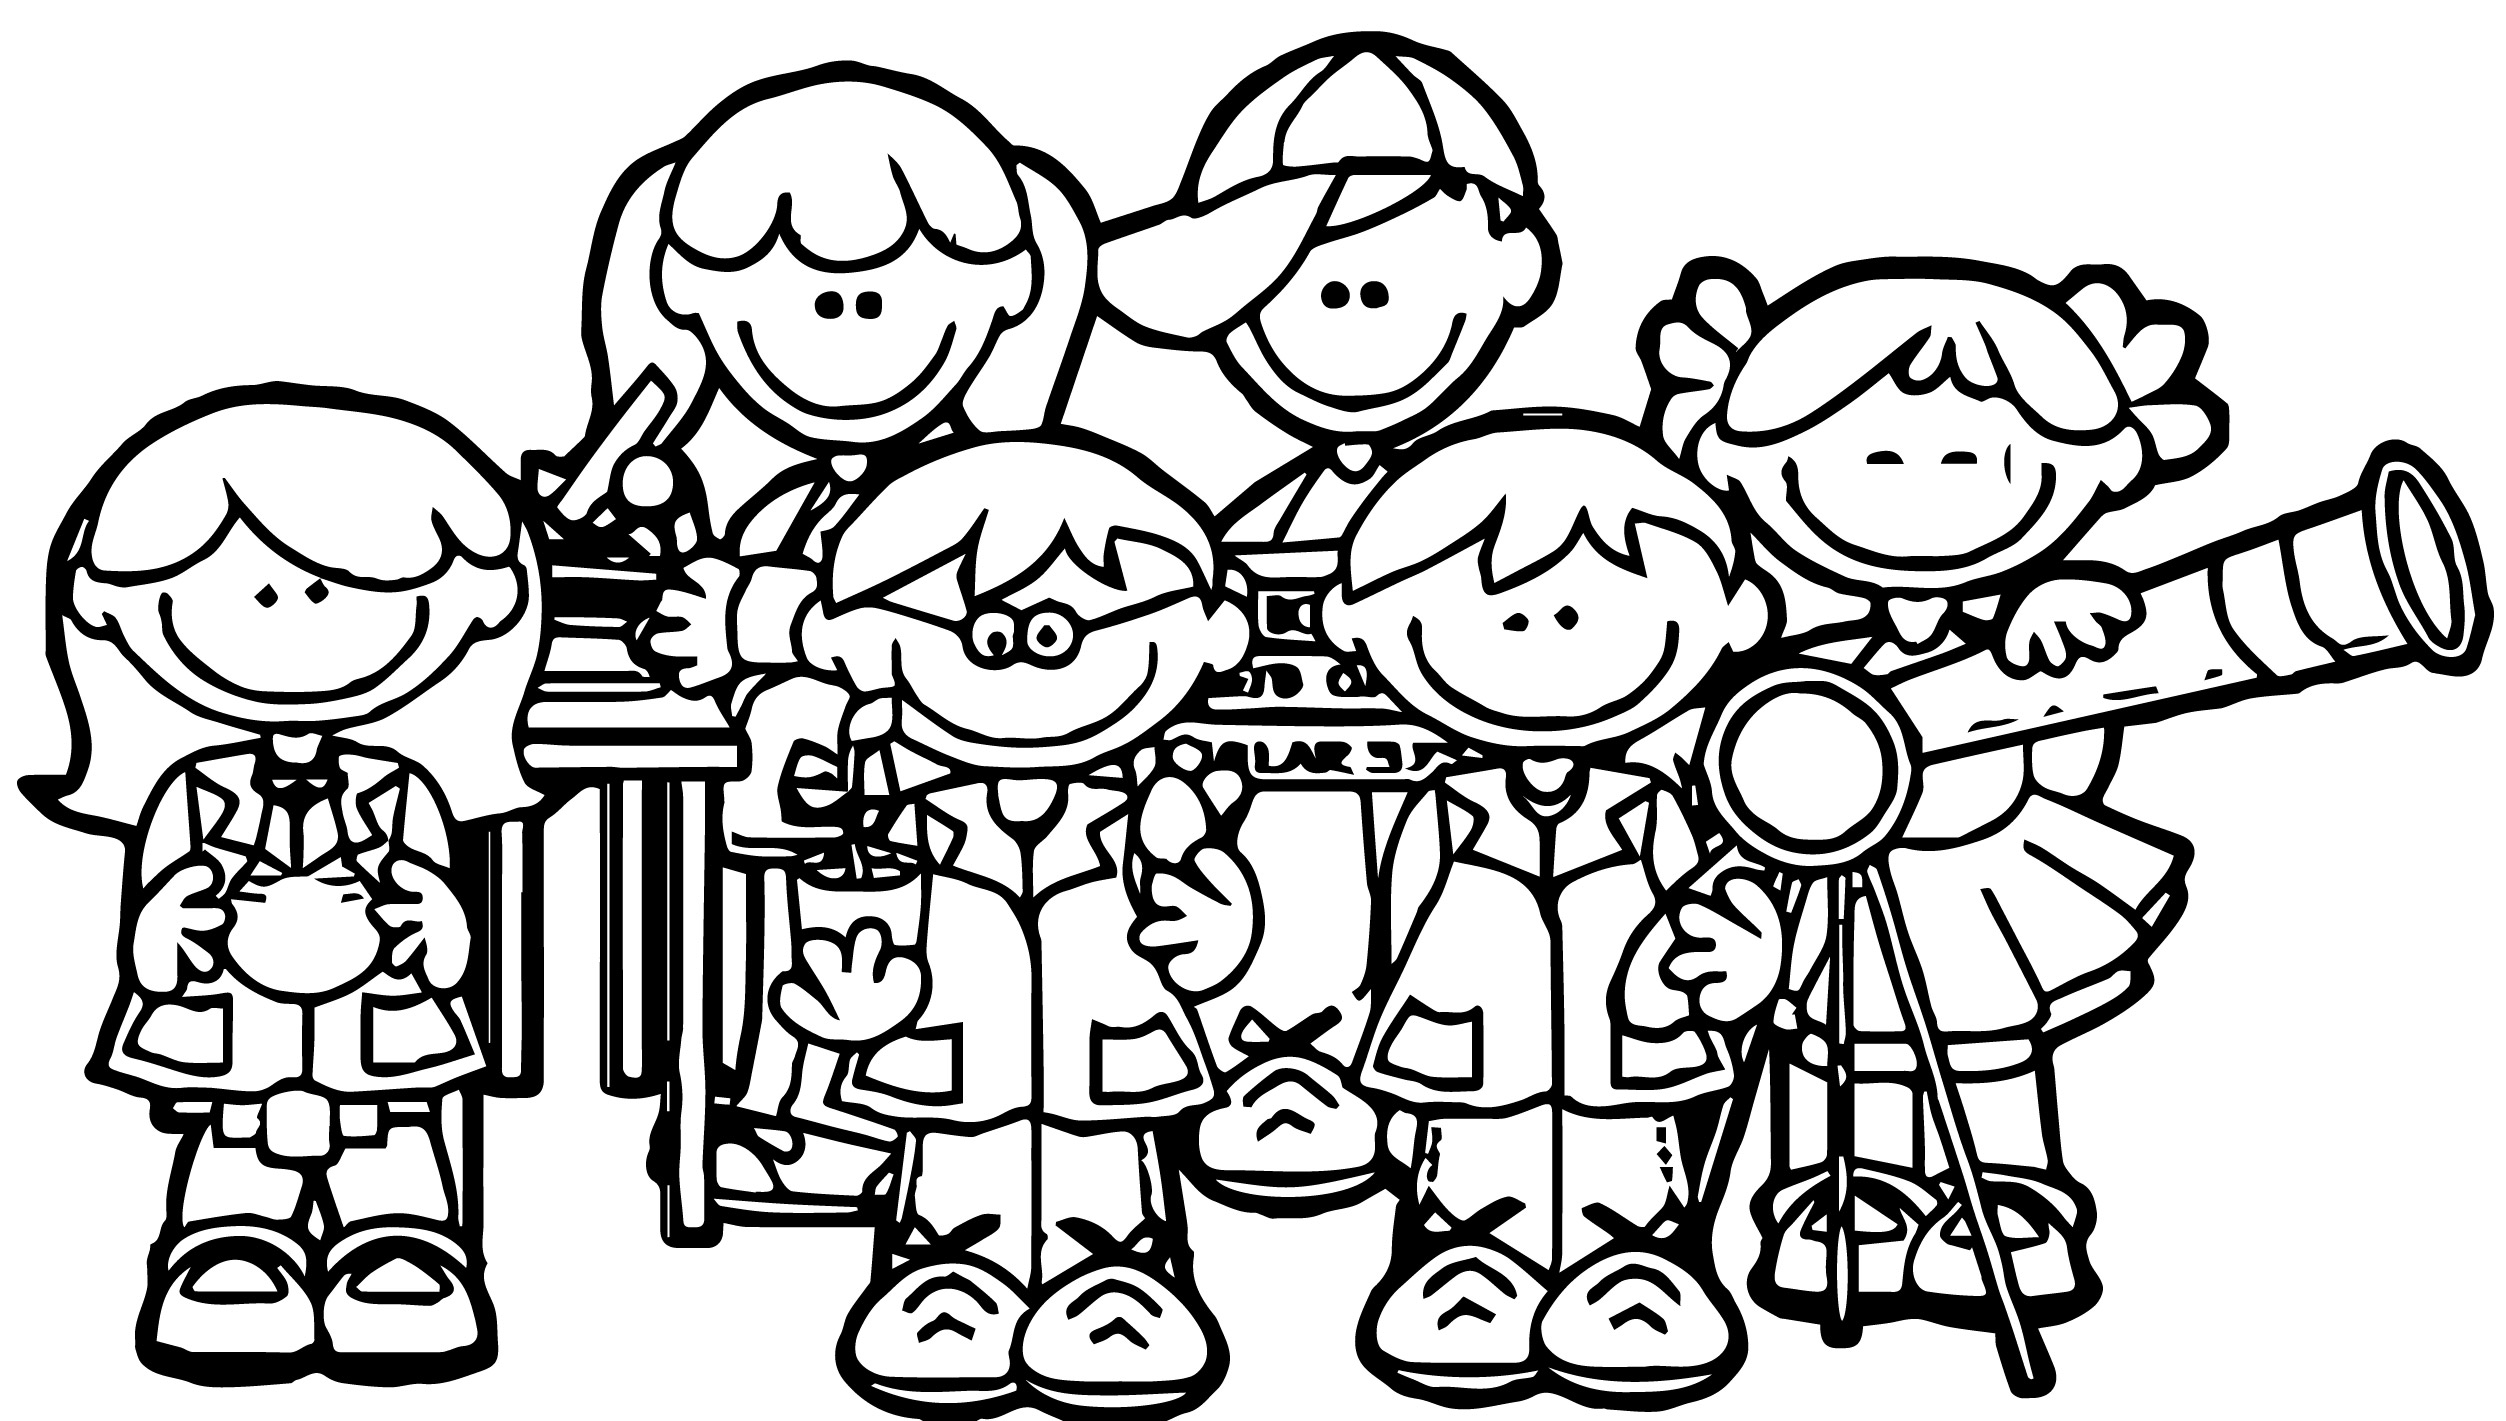 150f9a93c0807b2256978b72a910dccb7e Kids We Coloring Page